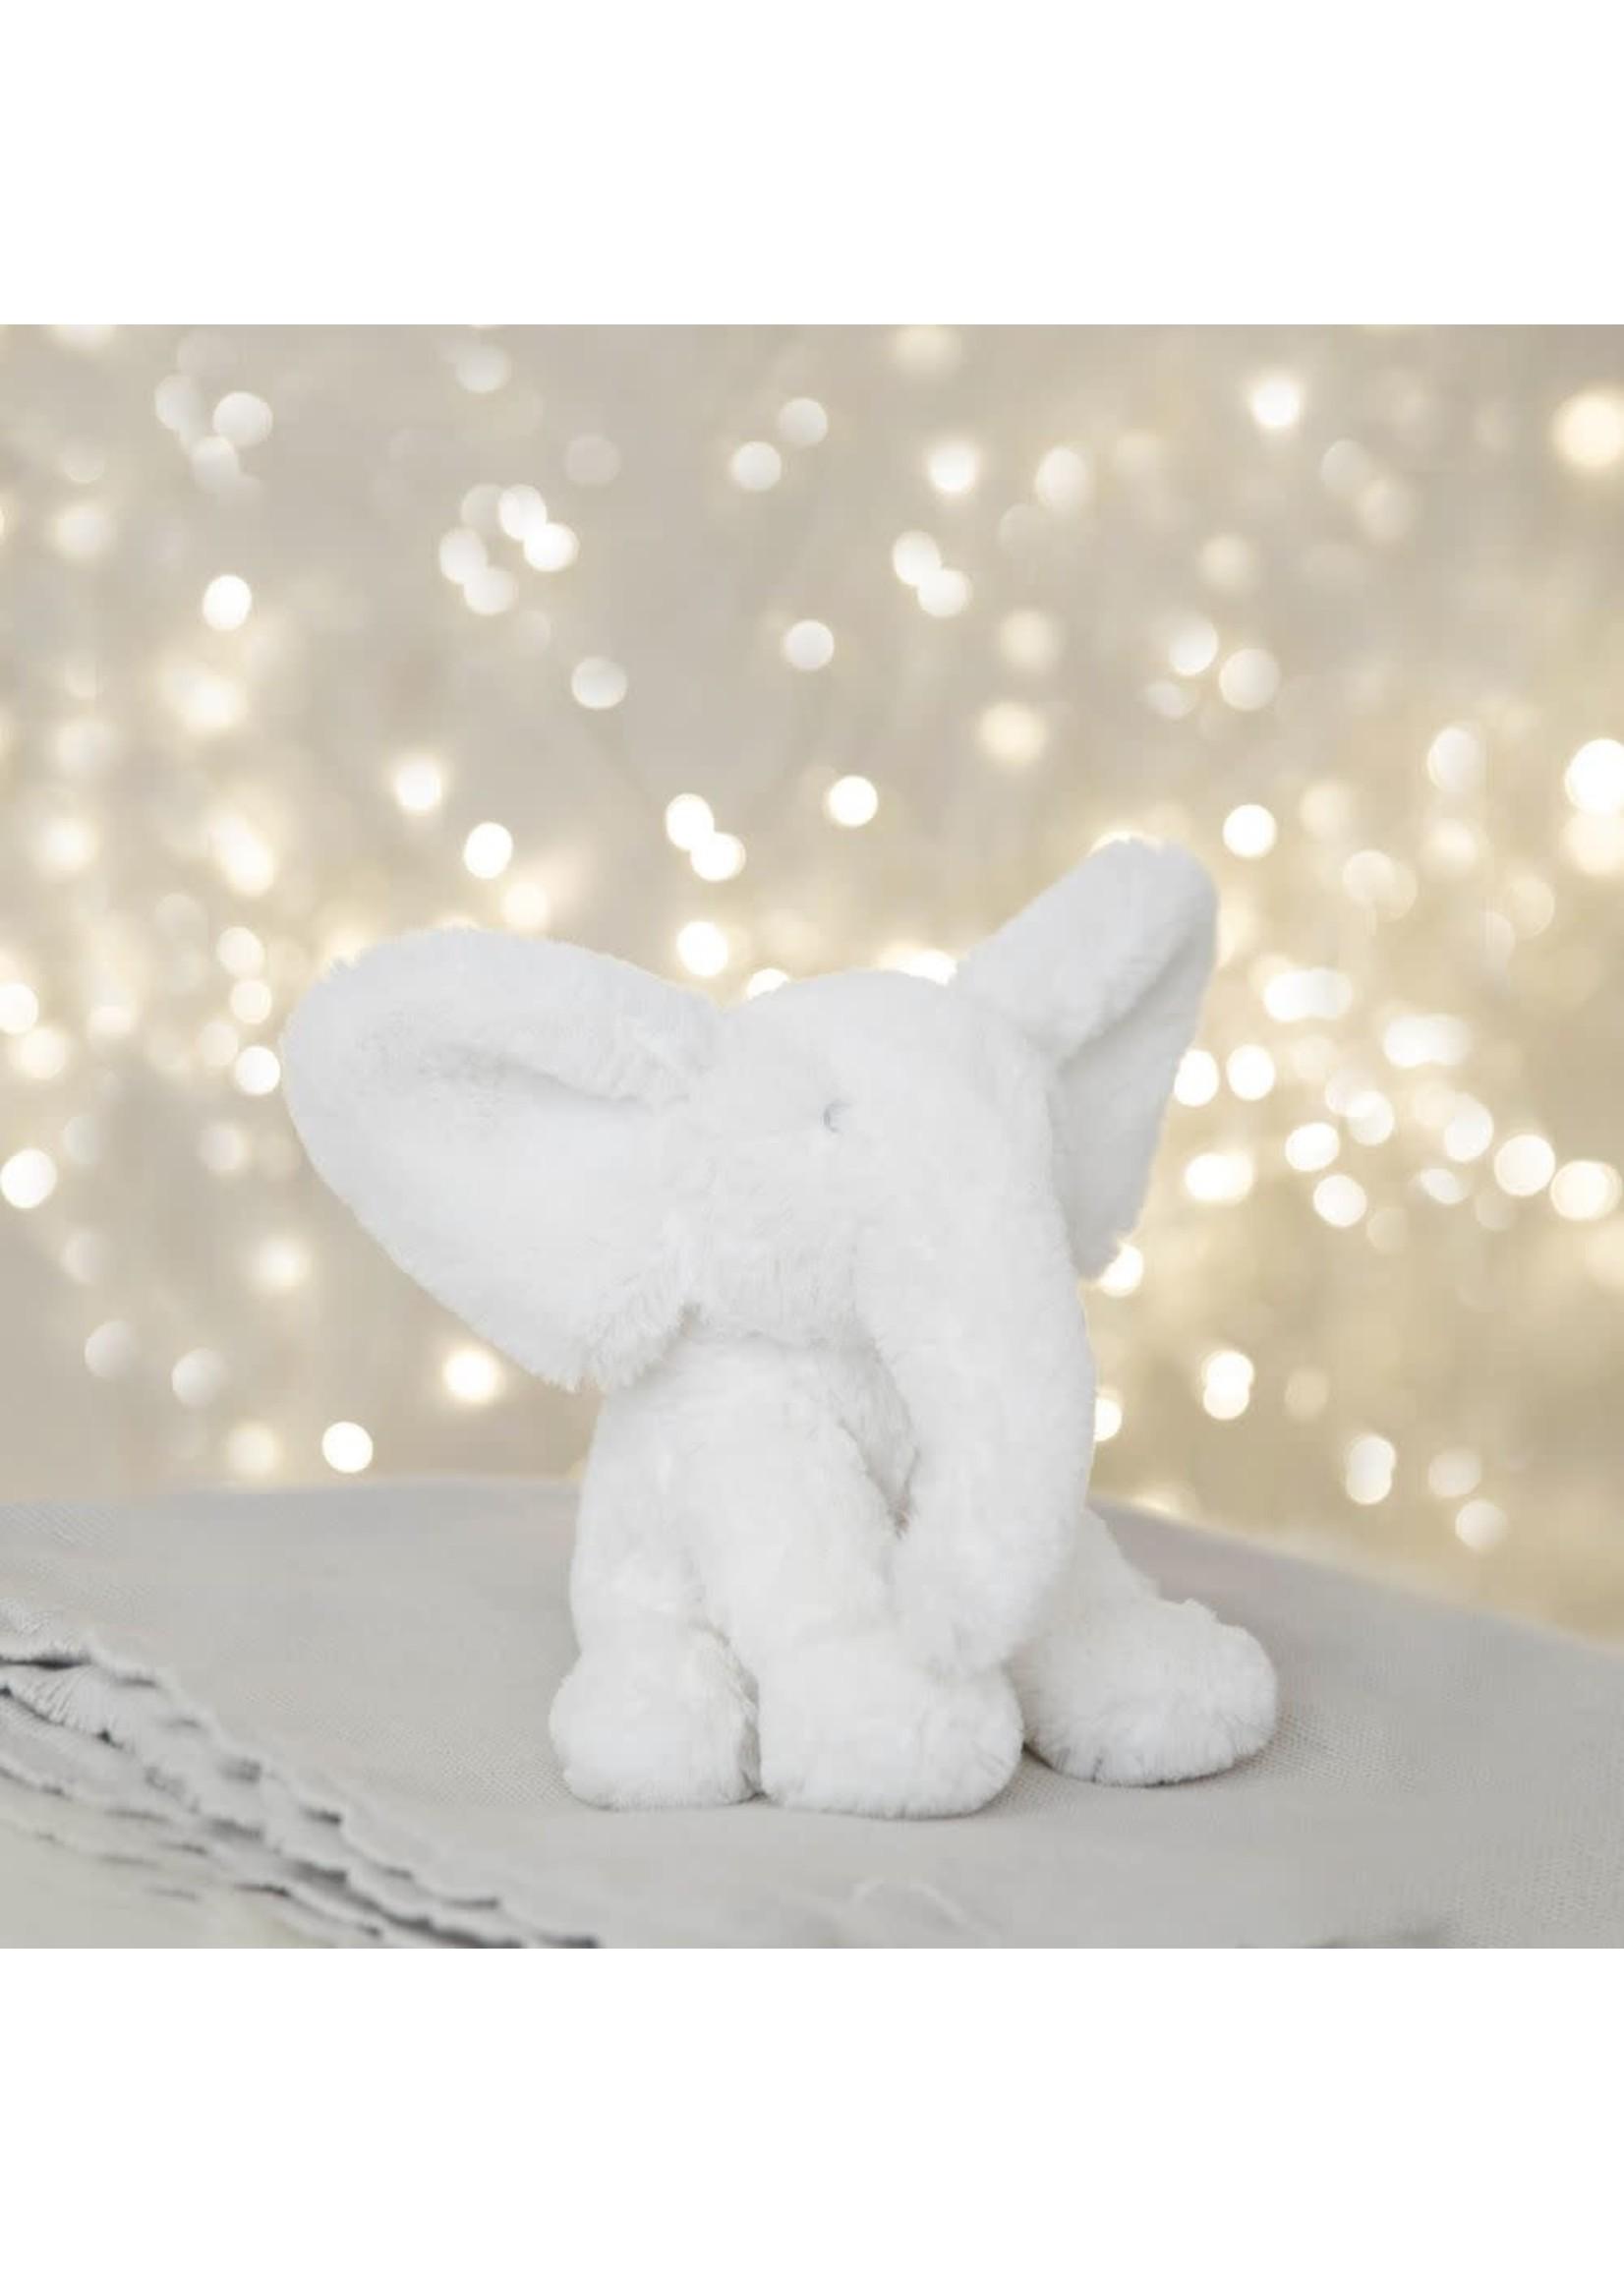 BAMBINO WHITE PLUSH ELEPHANT SMALL 13CM